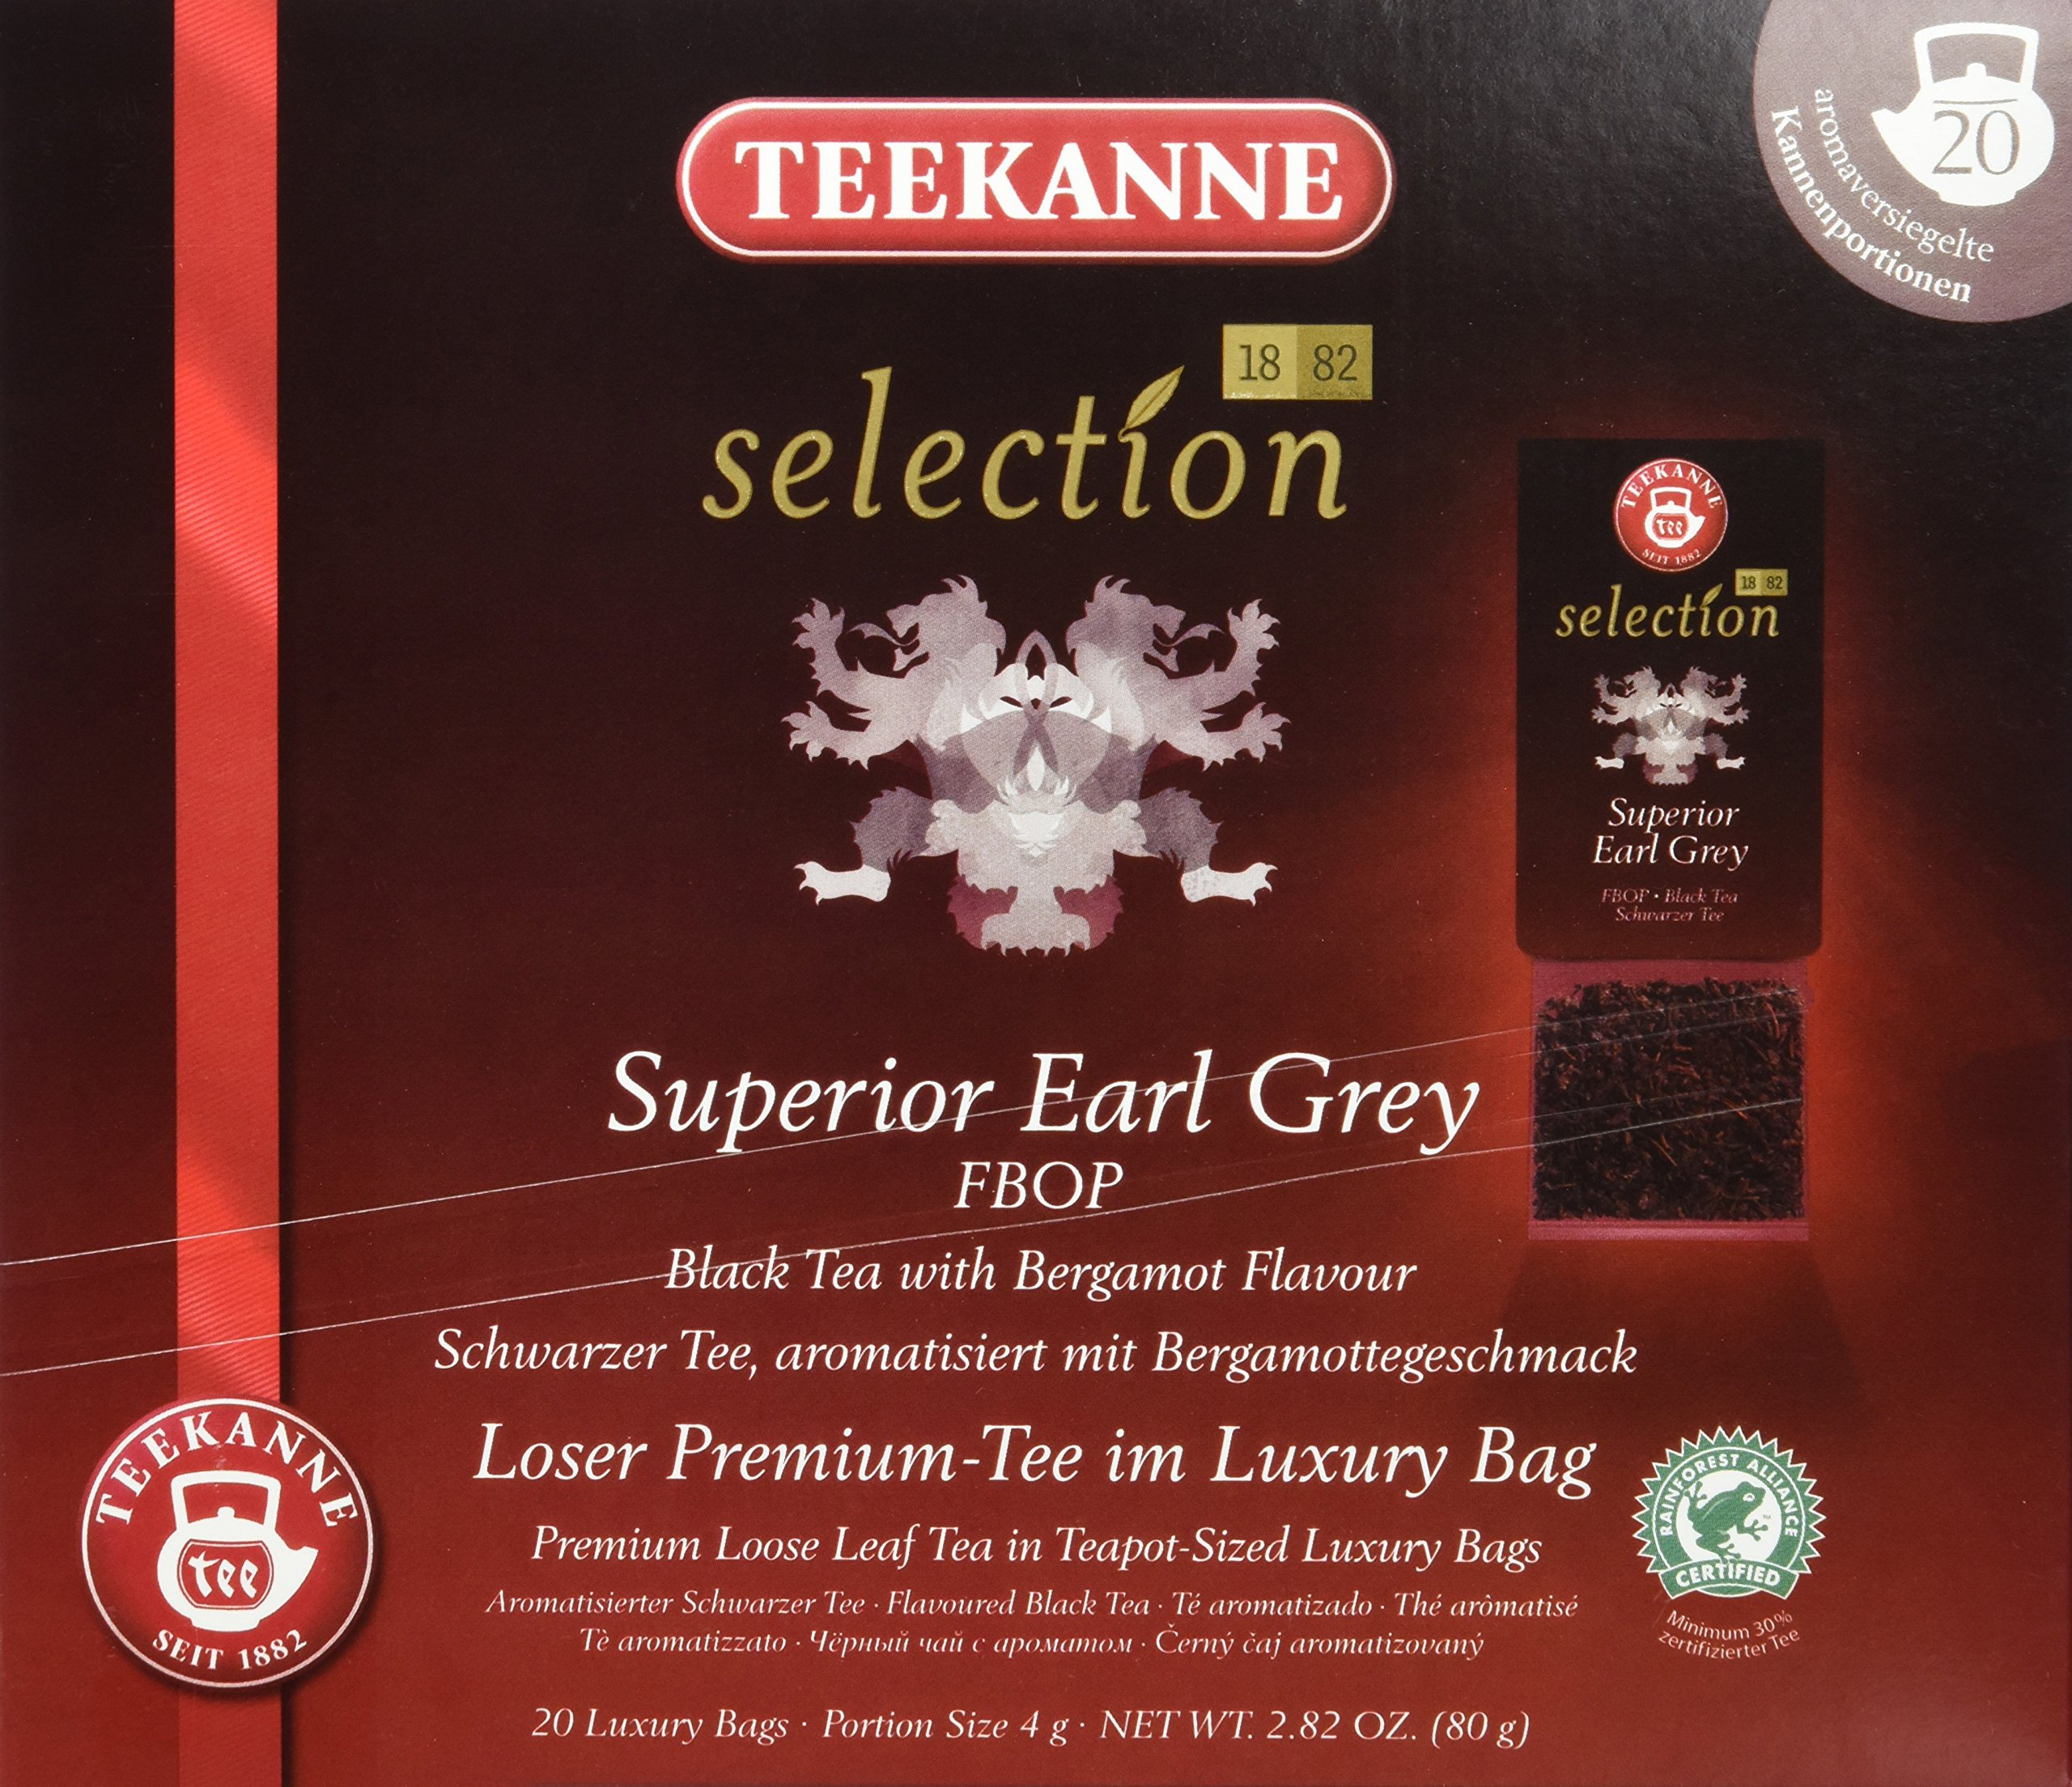 Teekanne-Selection-1882-im-Luxury-Bag-Earl-Grey-leicht-blumig-fruchtig-20-Portionen-1er-Pack-1-x-80-g